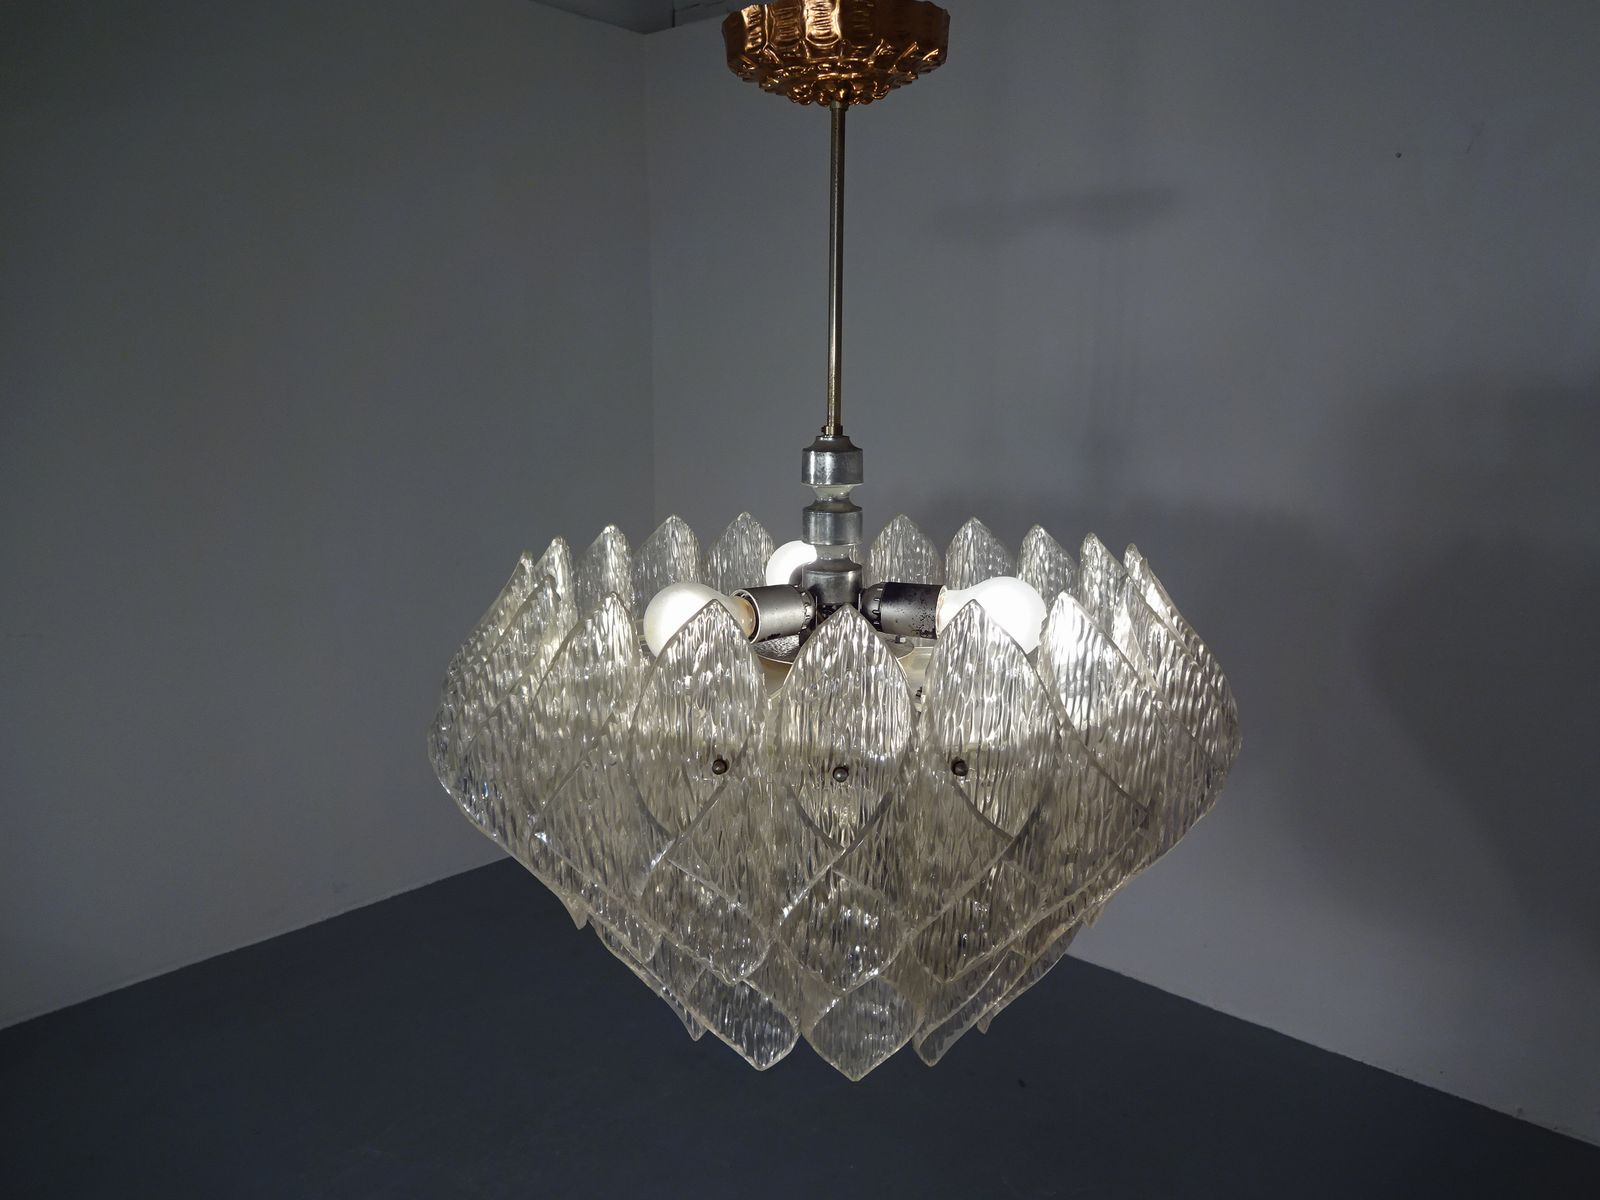 Große Space Age Lampe aus Plexiglas, 1970er